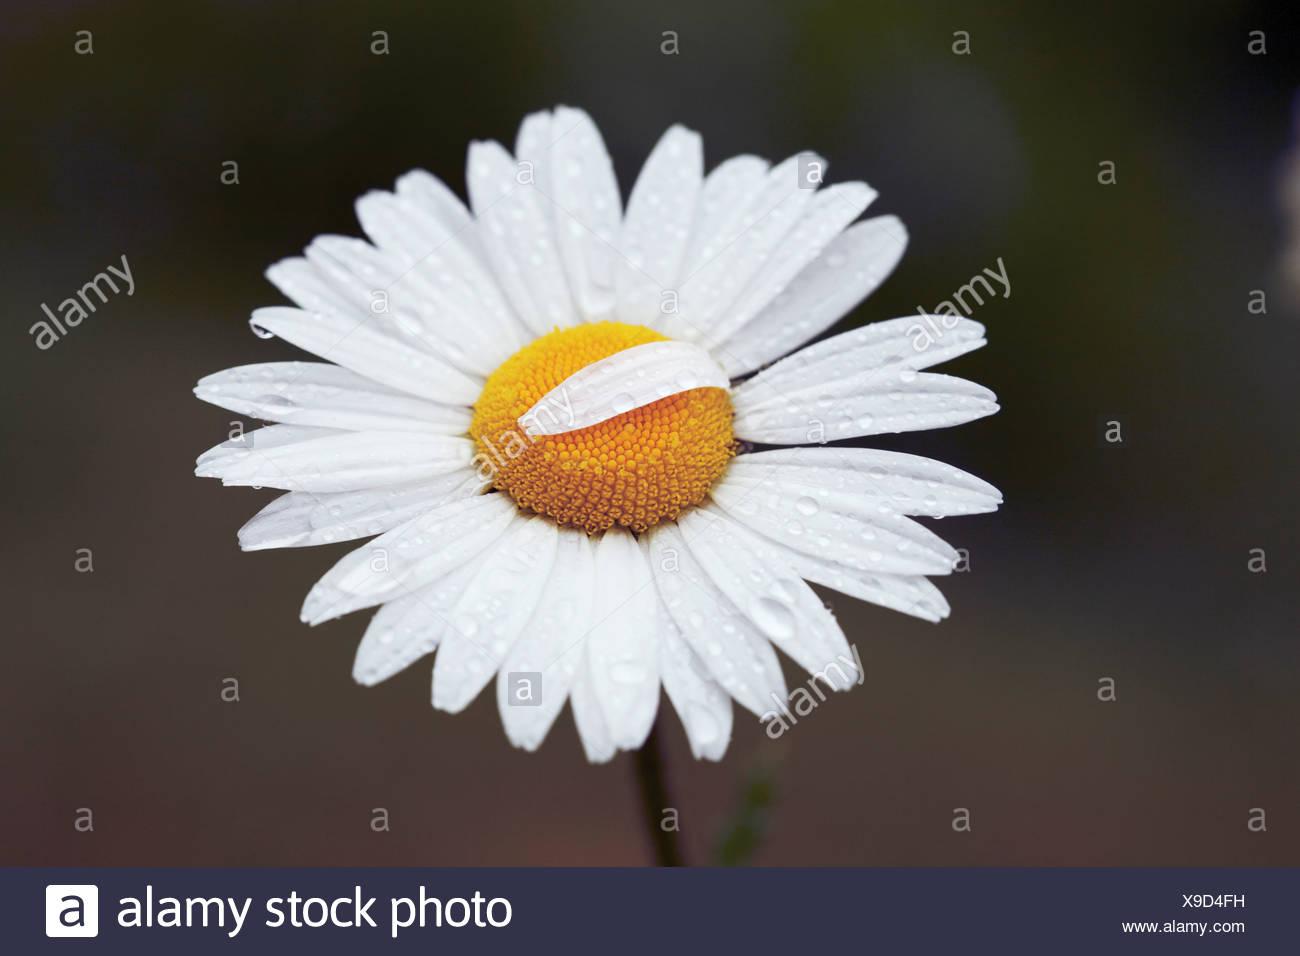 Leucanthemum vulgare, Daisy, Ox-eye daisy Stock Photo